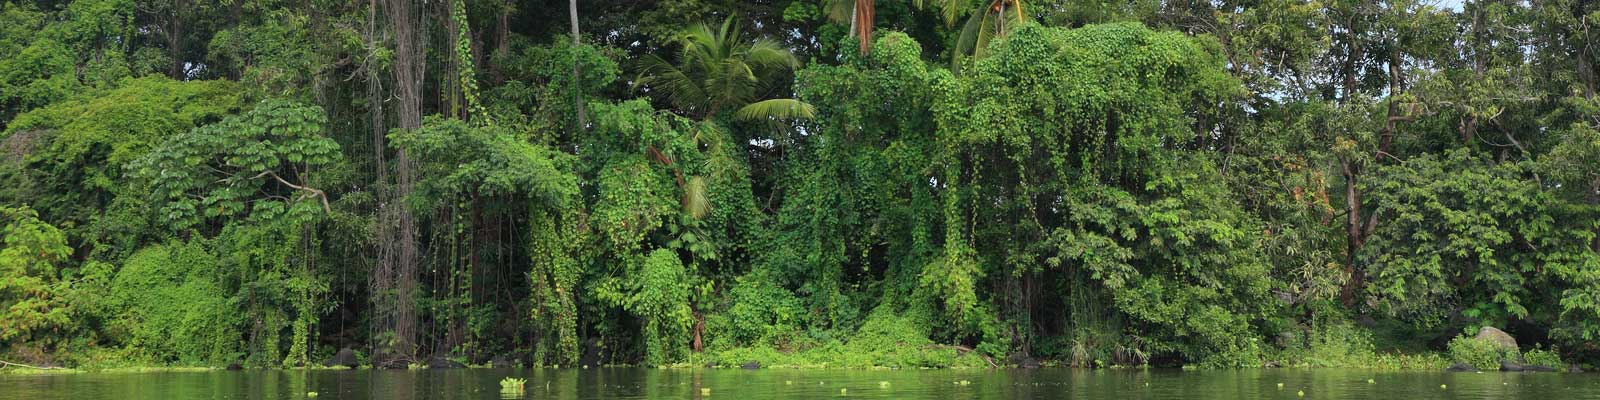 Nicaragua Lagos Florestas Ferias de tempo longo. Casas grandes e pequenas.